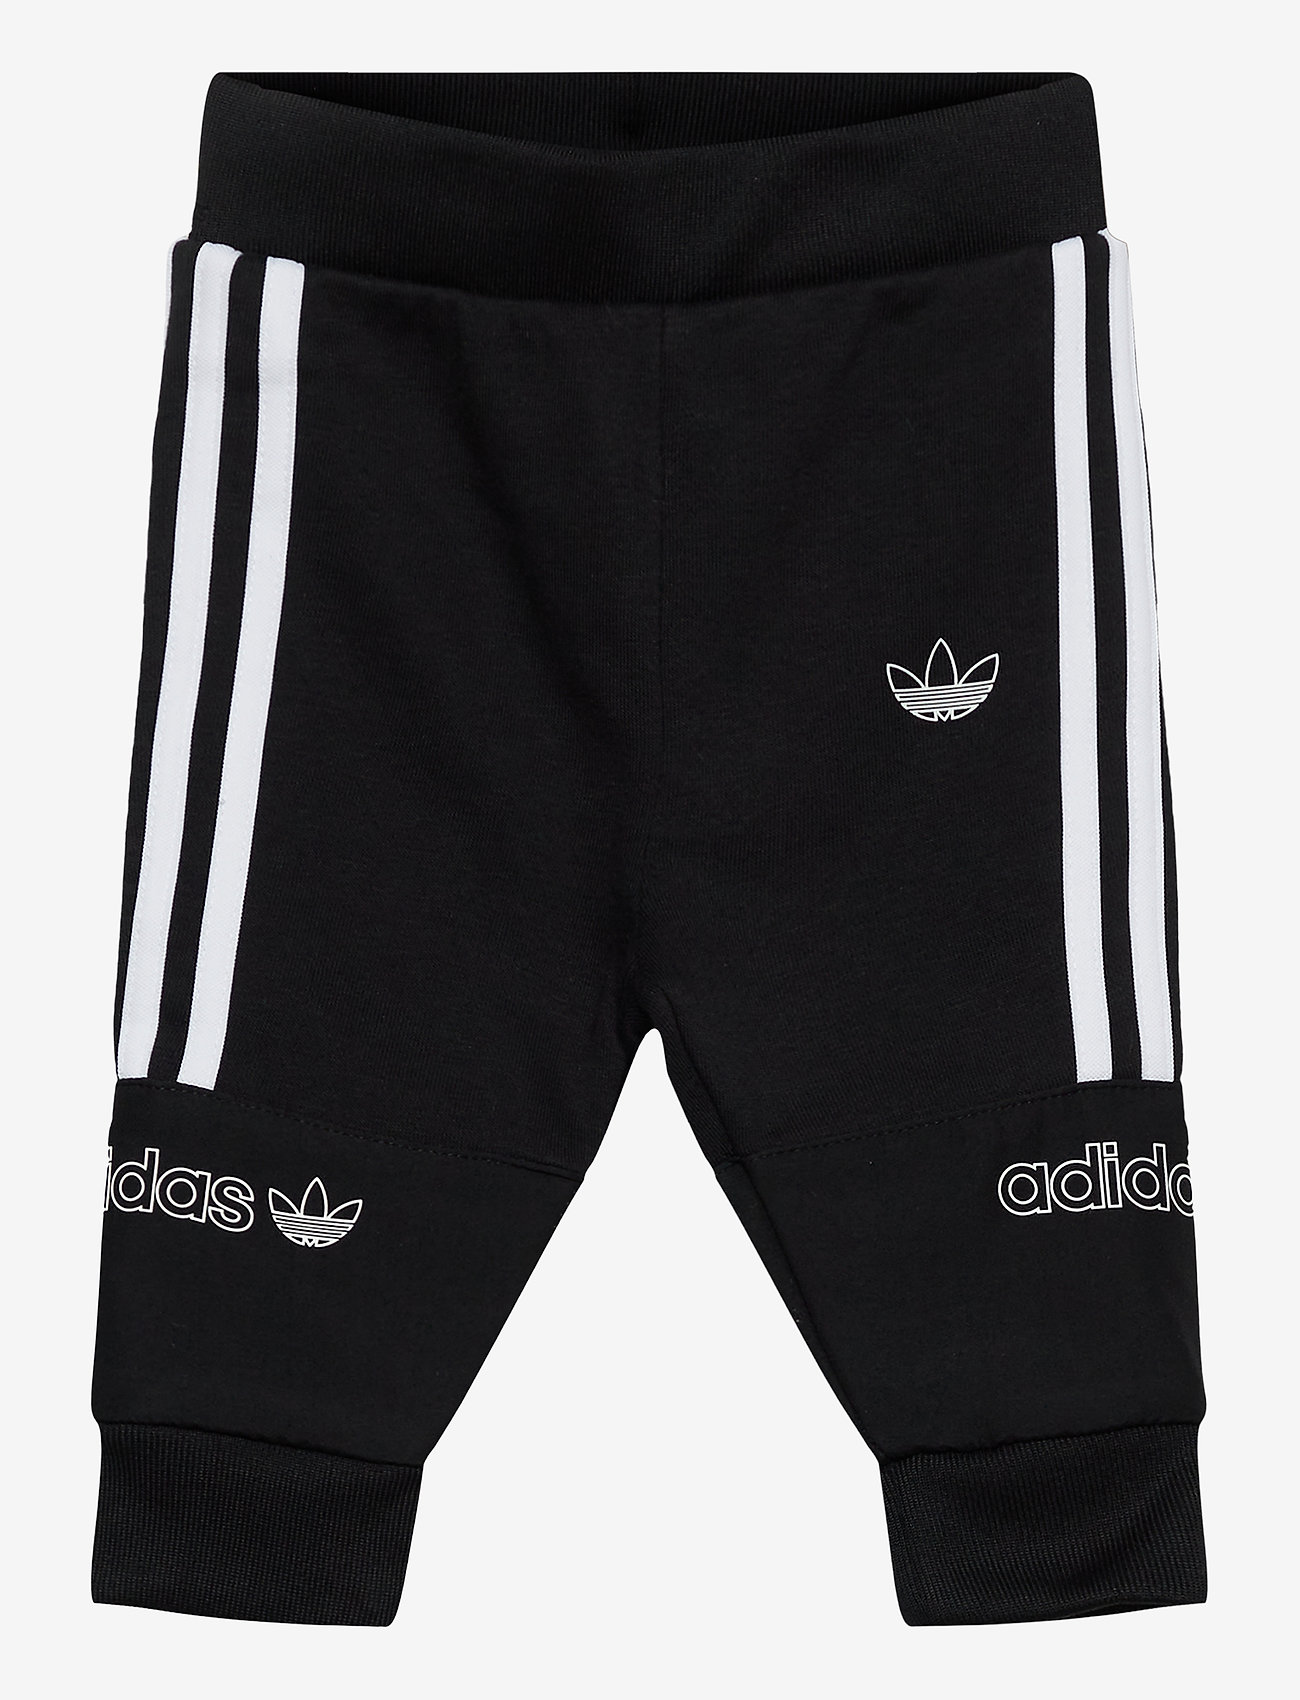 Bx 2.0 Crew Set (Bluspi/white/black) (39.95 €) - adidas Originals QzCkx